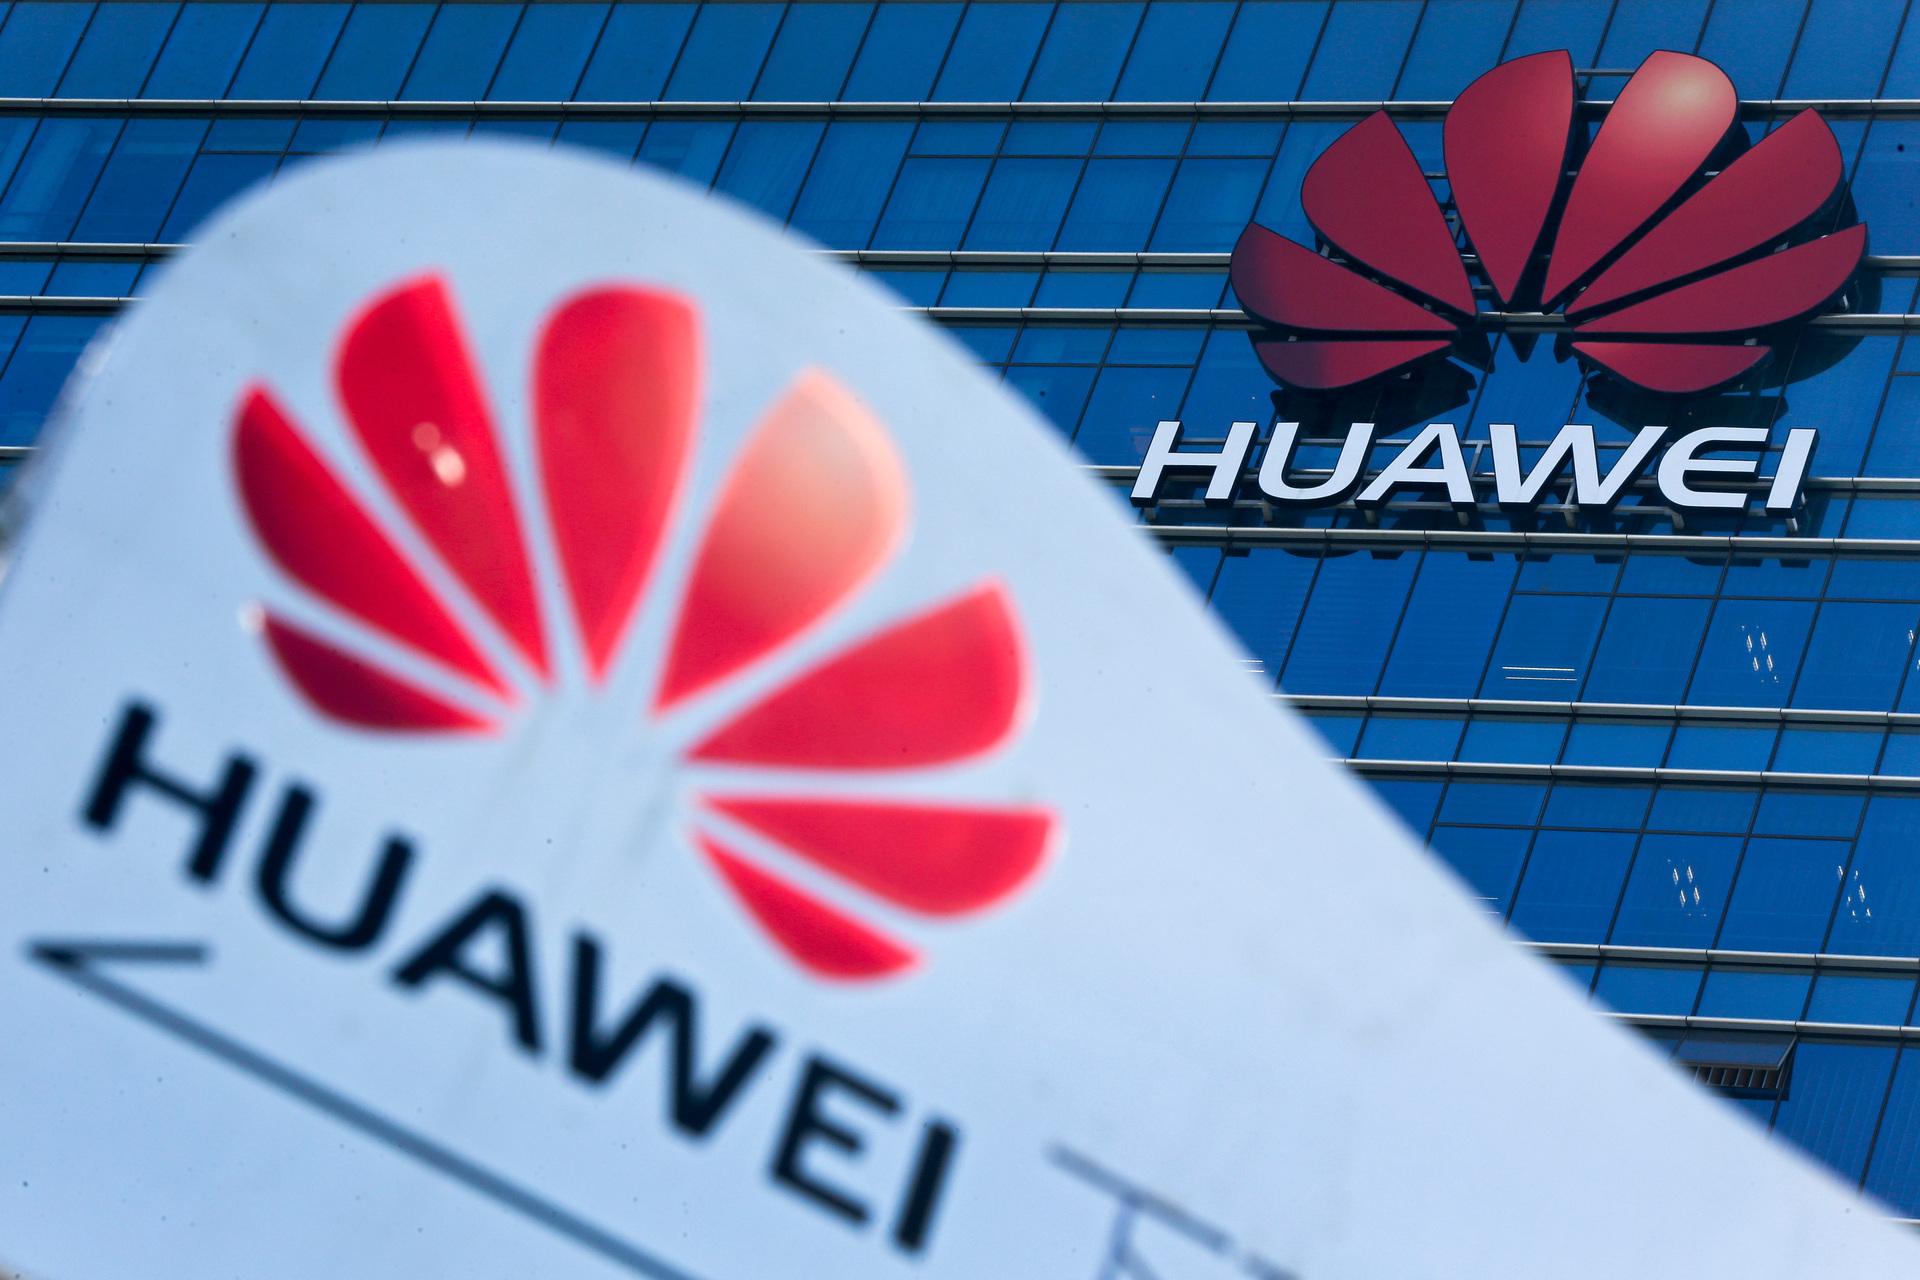 Juha Saarinen: The real reason Huawei shouldn't be in 5G networks